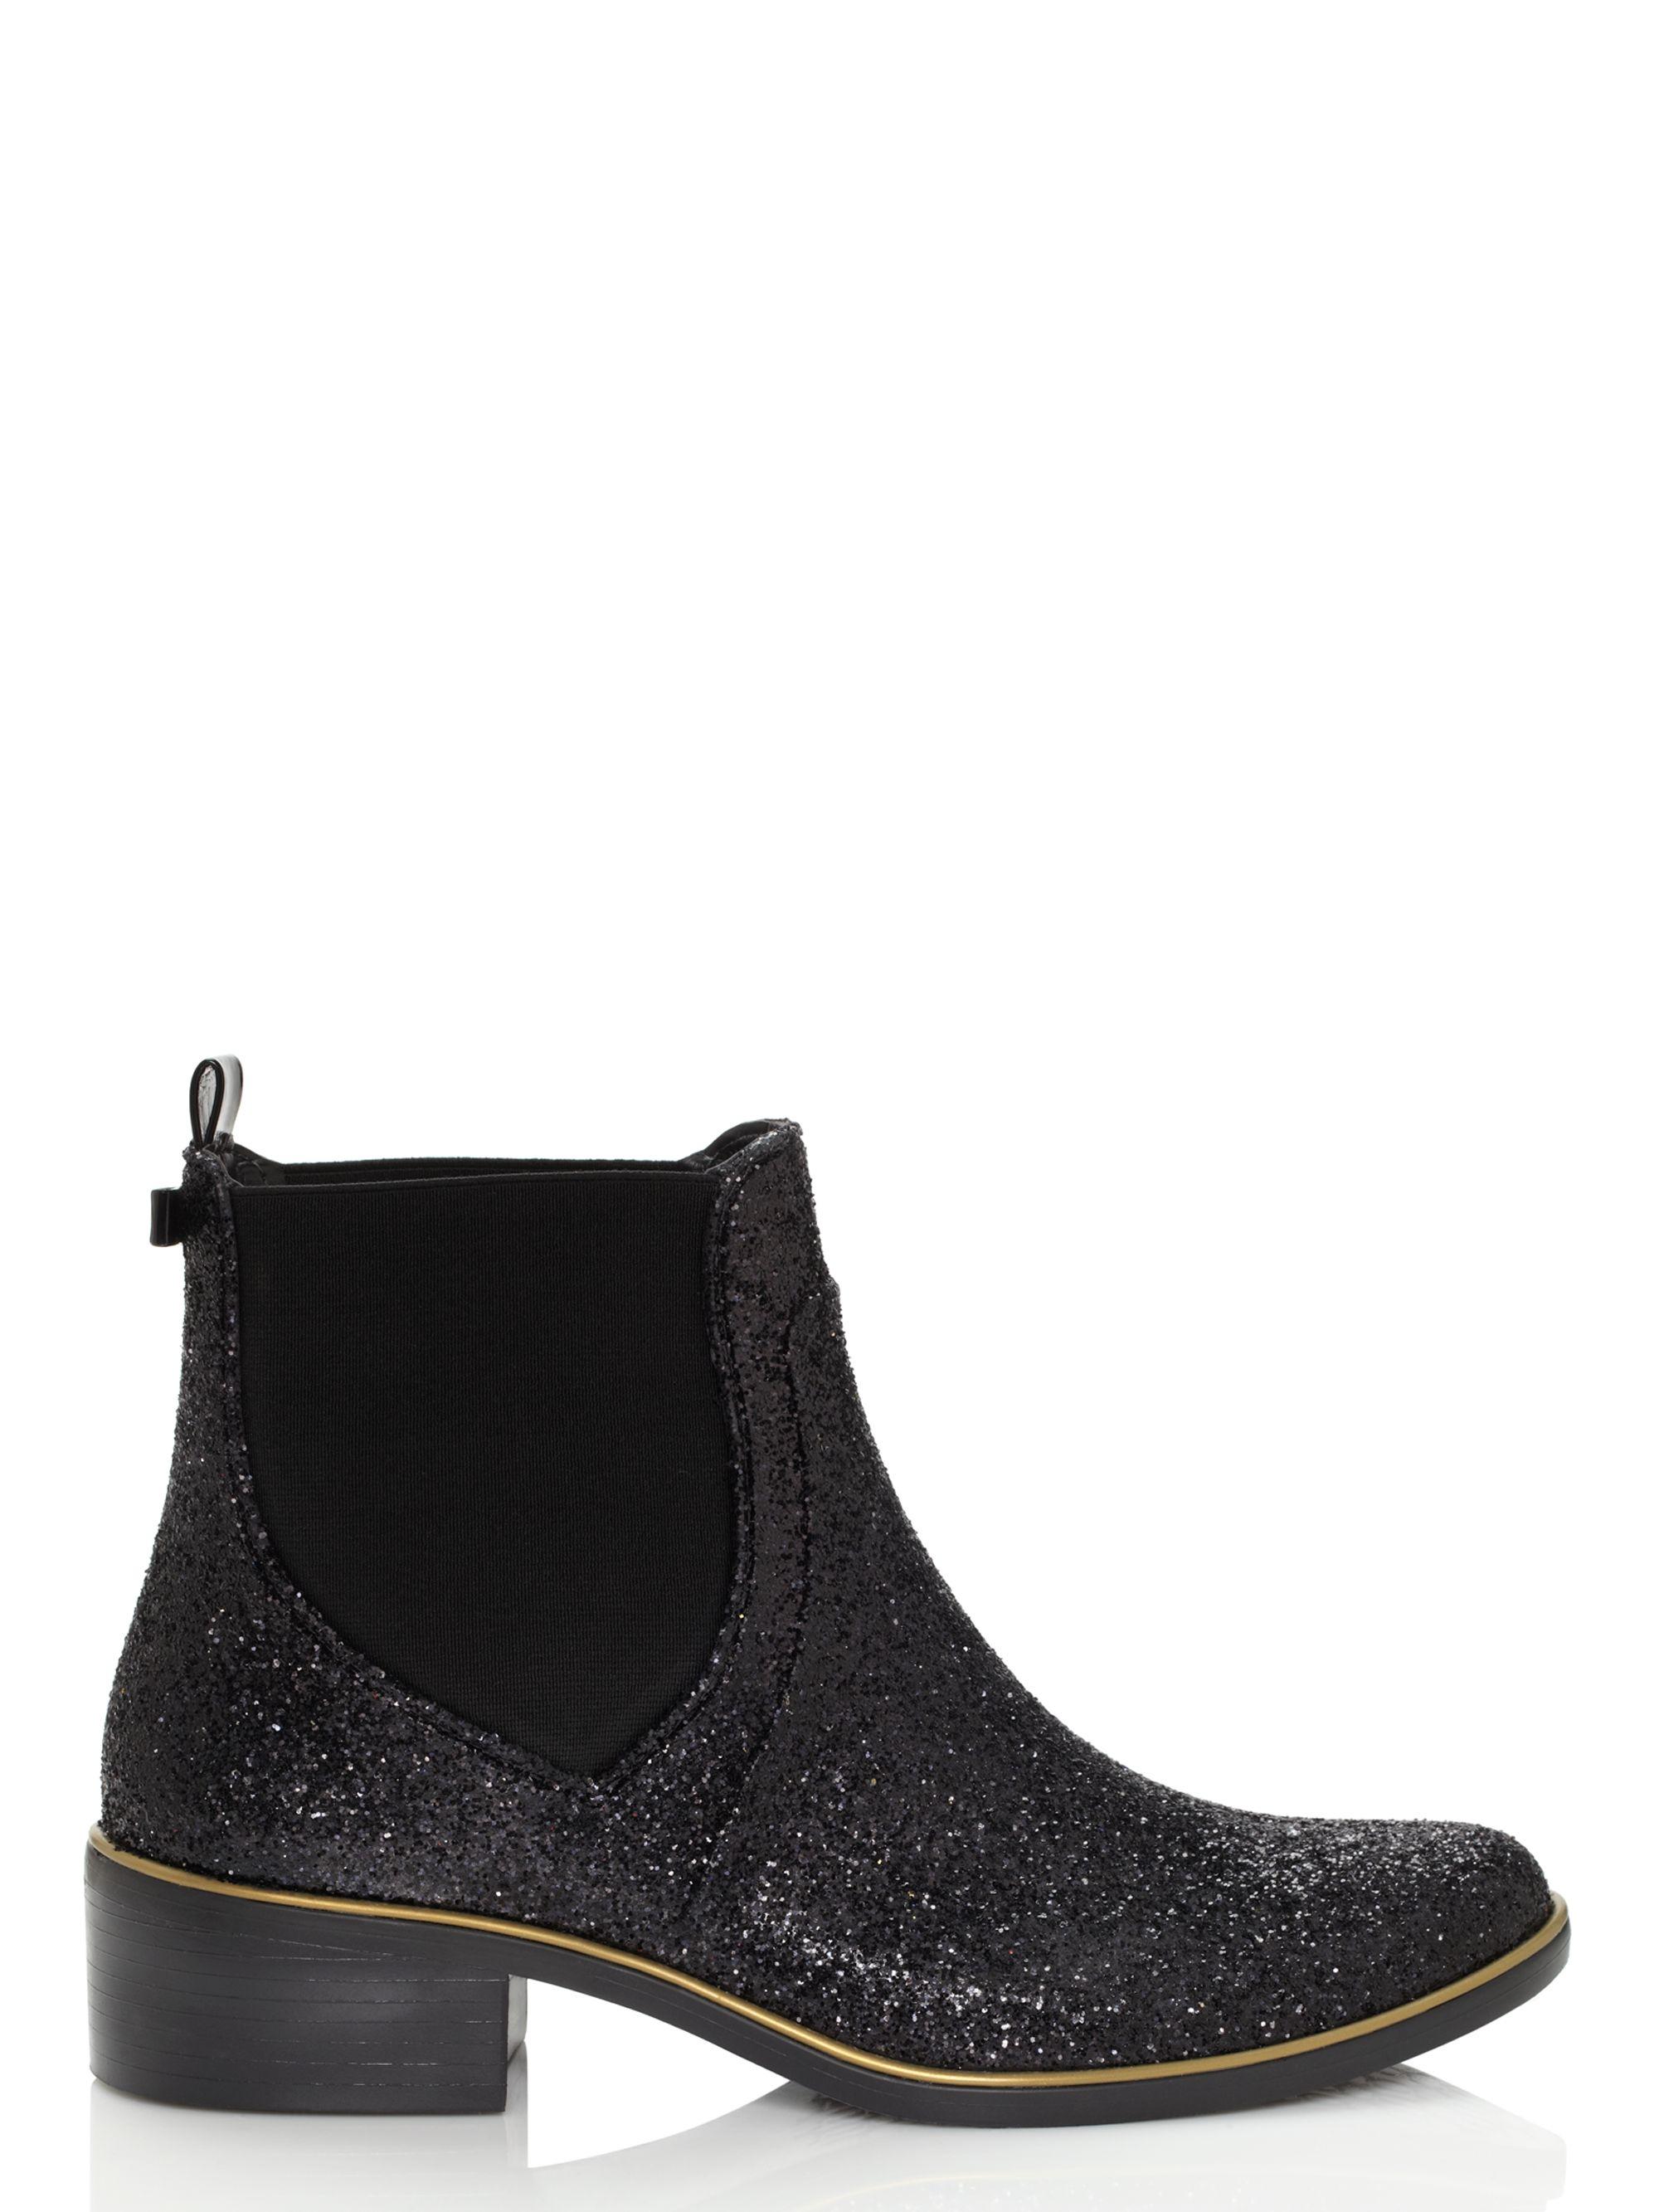 Kate Spade Sedgewick Glitter Rain Boots